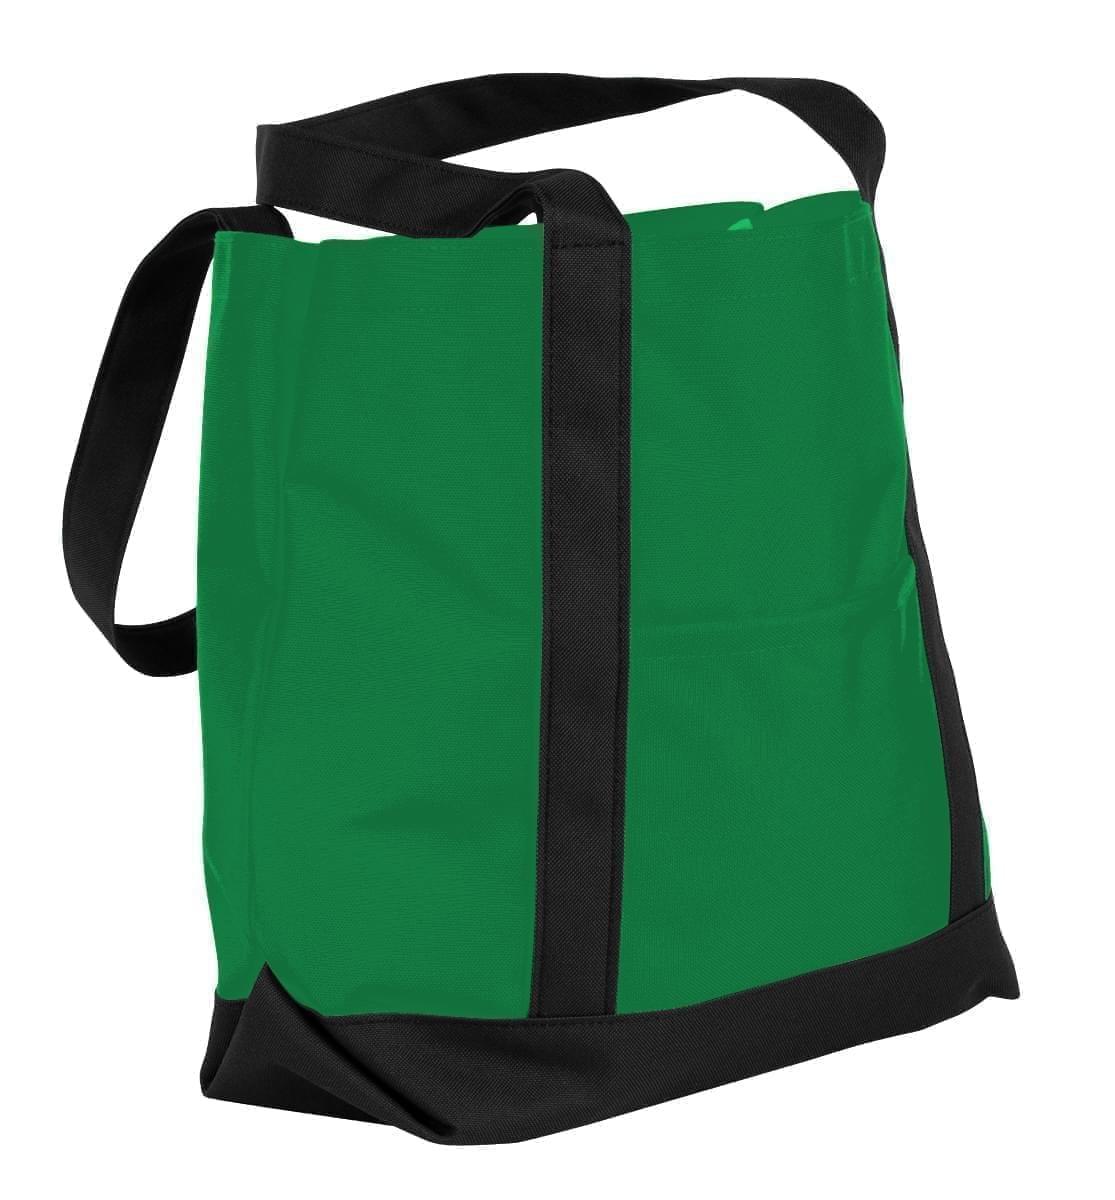 USA Made Nylon Poly Boat Tote Bags, Kelly Green-Black, XAACL1UATC